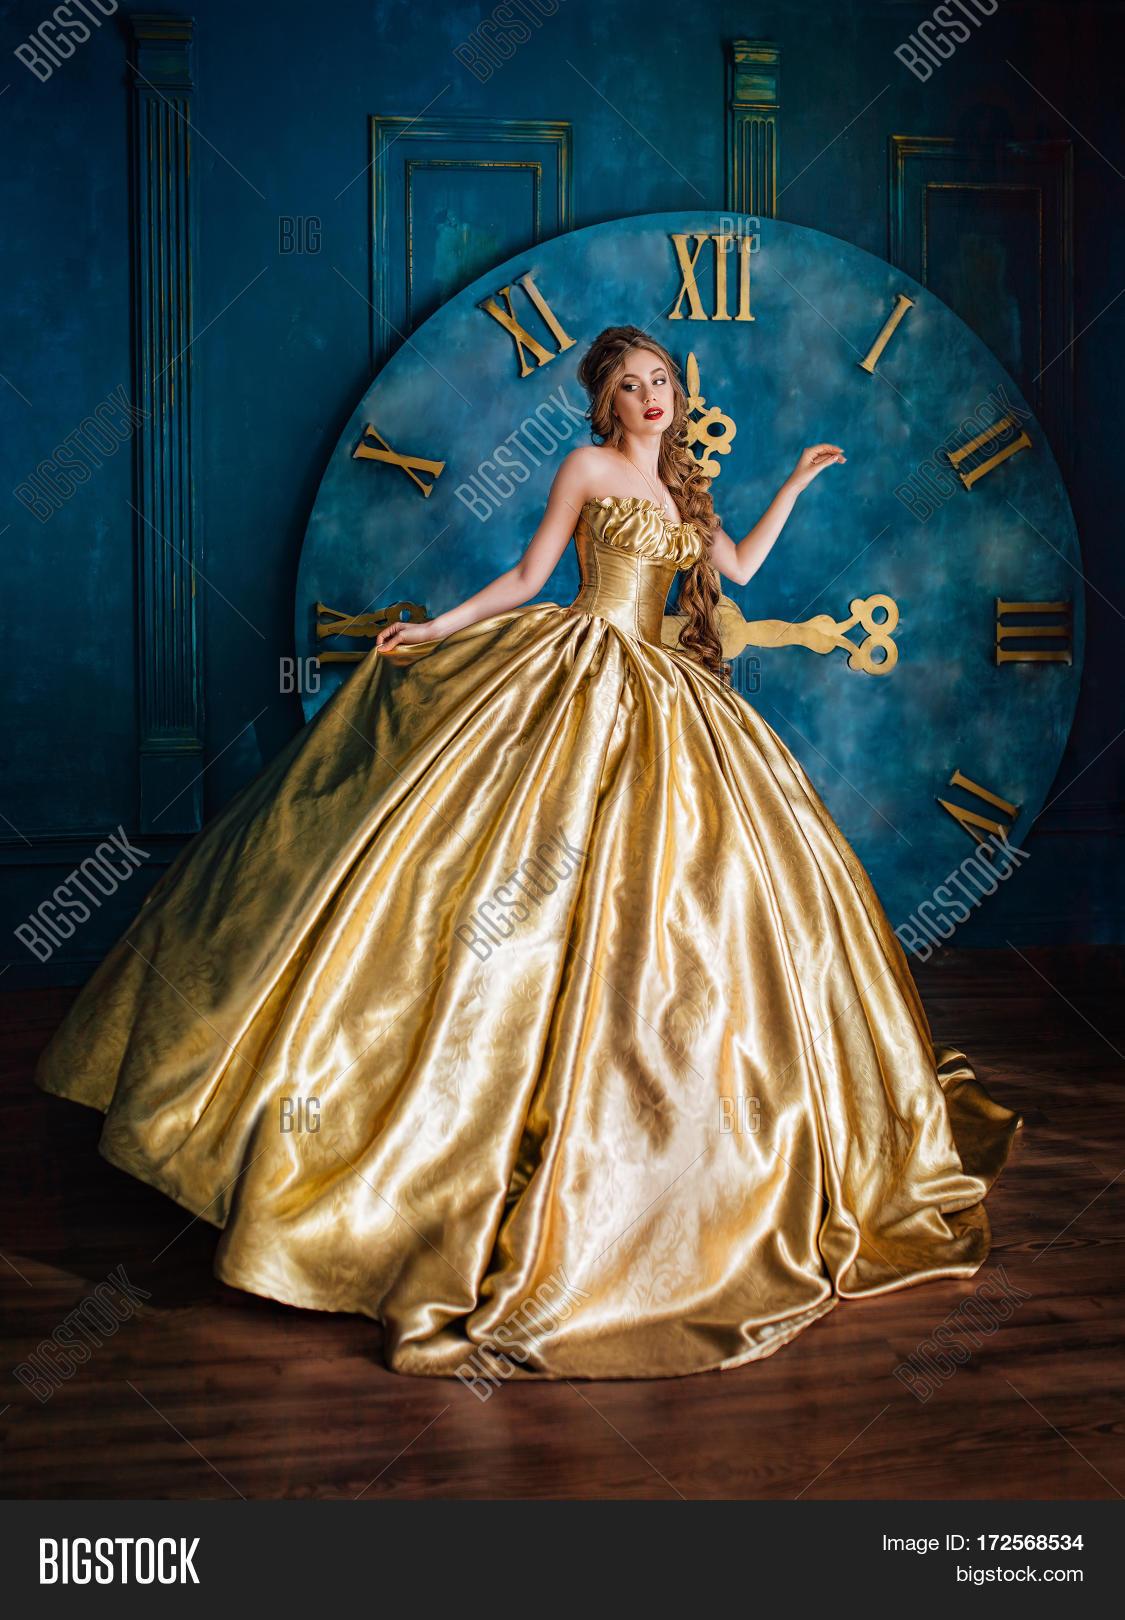 Beautiful Woman Golden Ball Gown Image & Photo | Bigstock